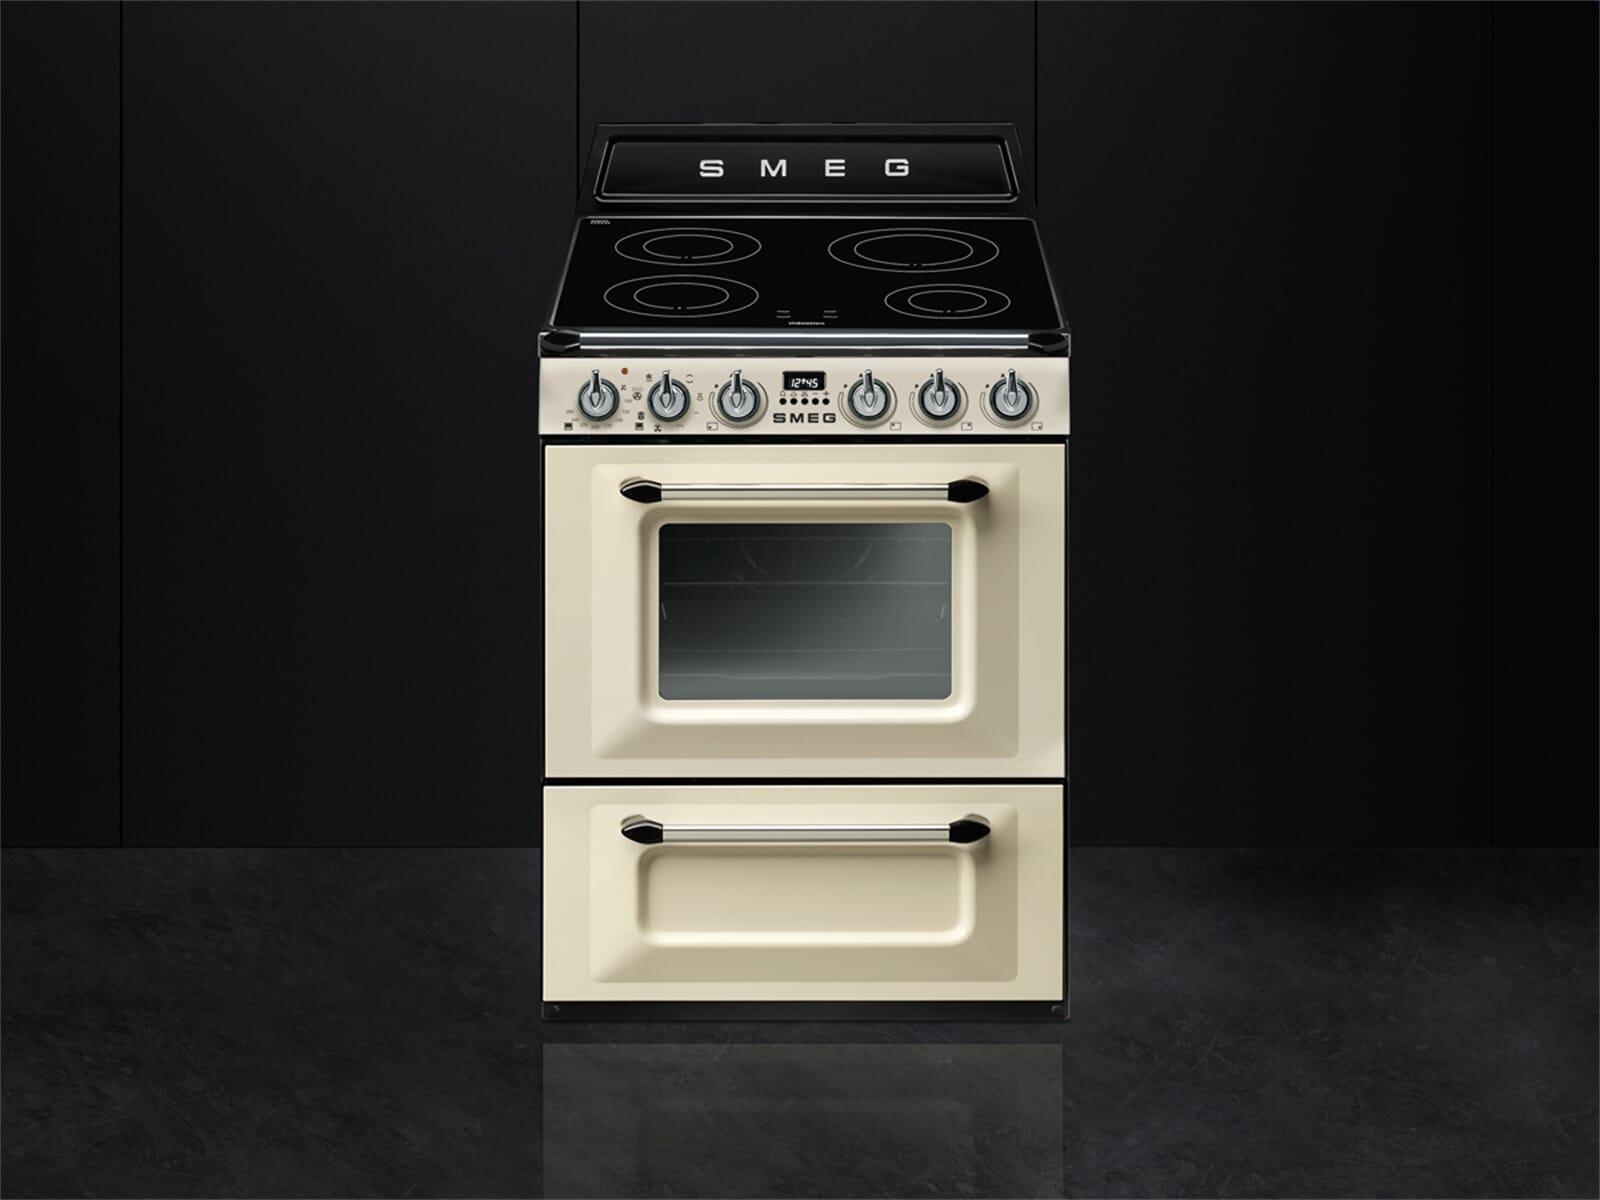 Retro Kühlschrank Pelgrim : Smeg kühlschrank creme gebraucht gas elektroherd kombination gas